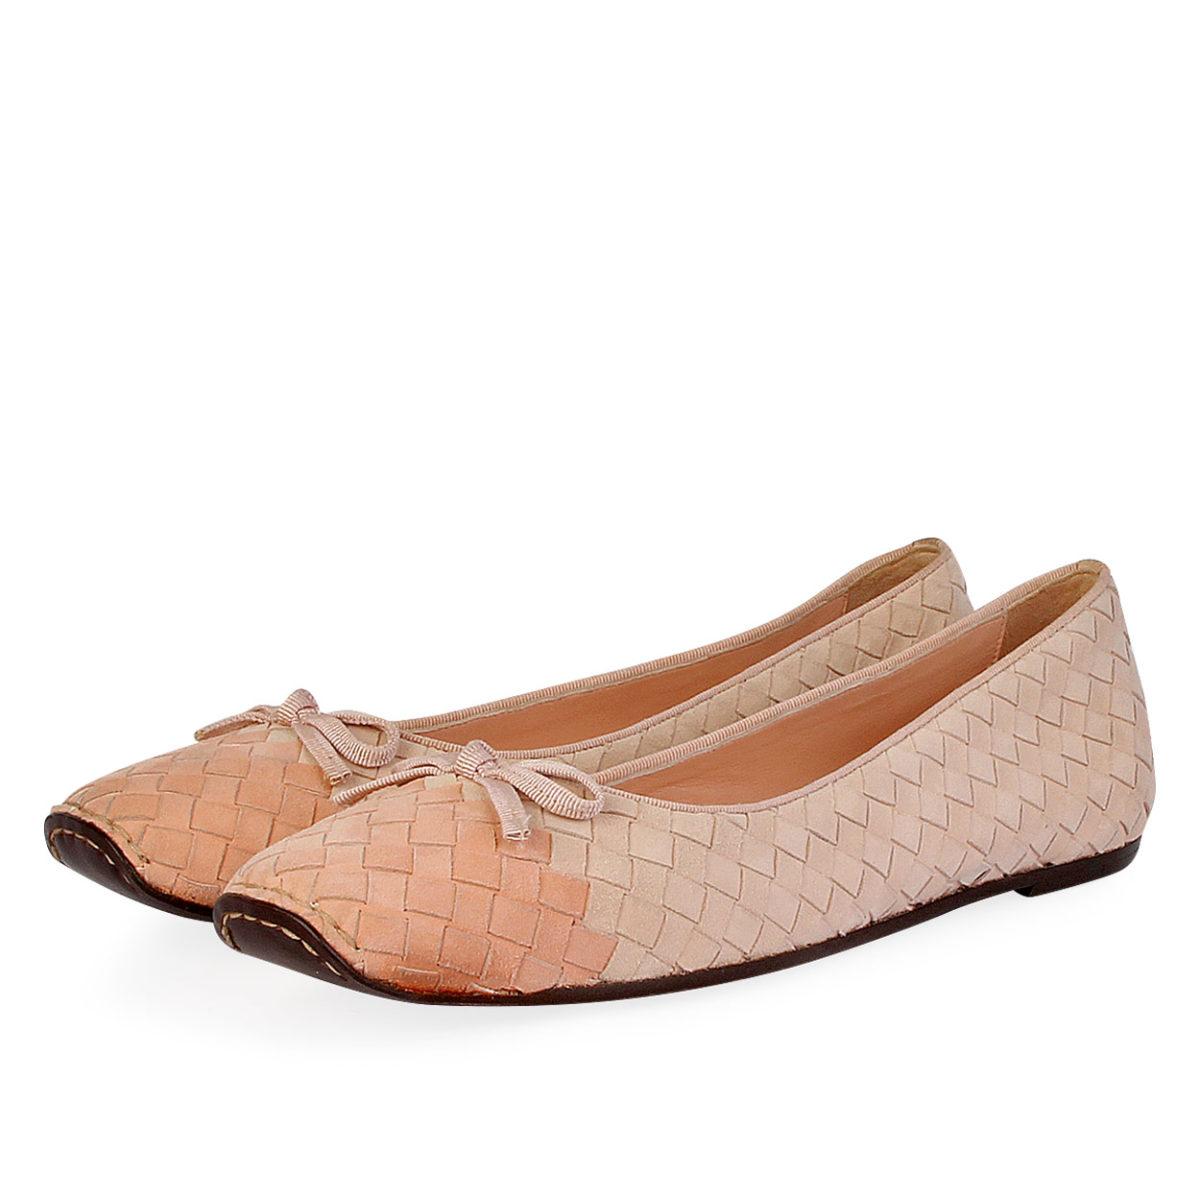 9807074b6 BOTTEGA VENETA Woven Suede Ballet Flats Blush Pink - S: 40.5 (7 ...